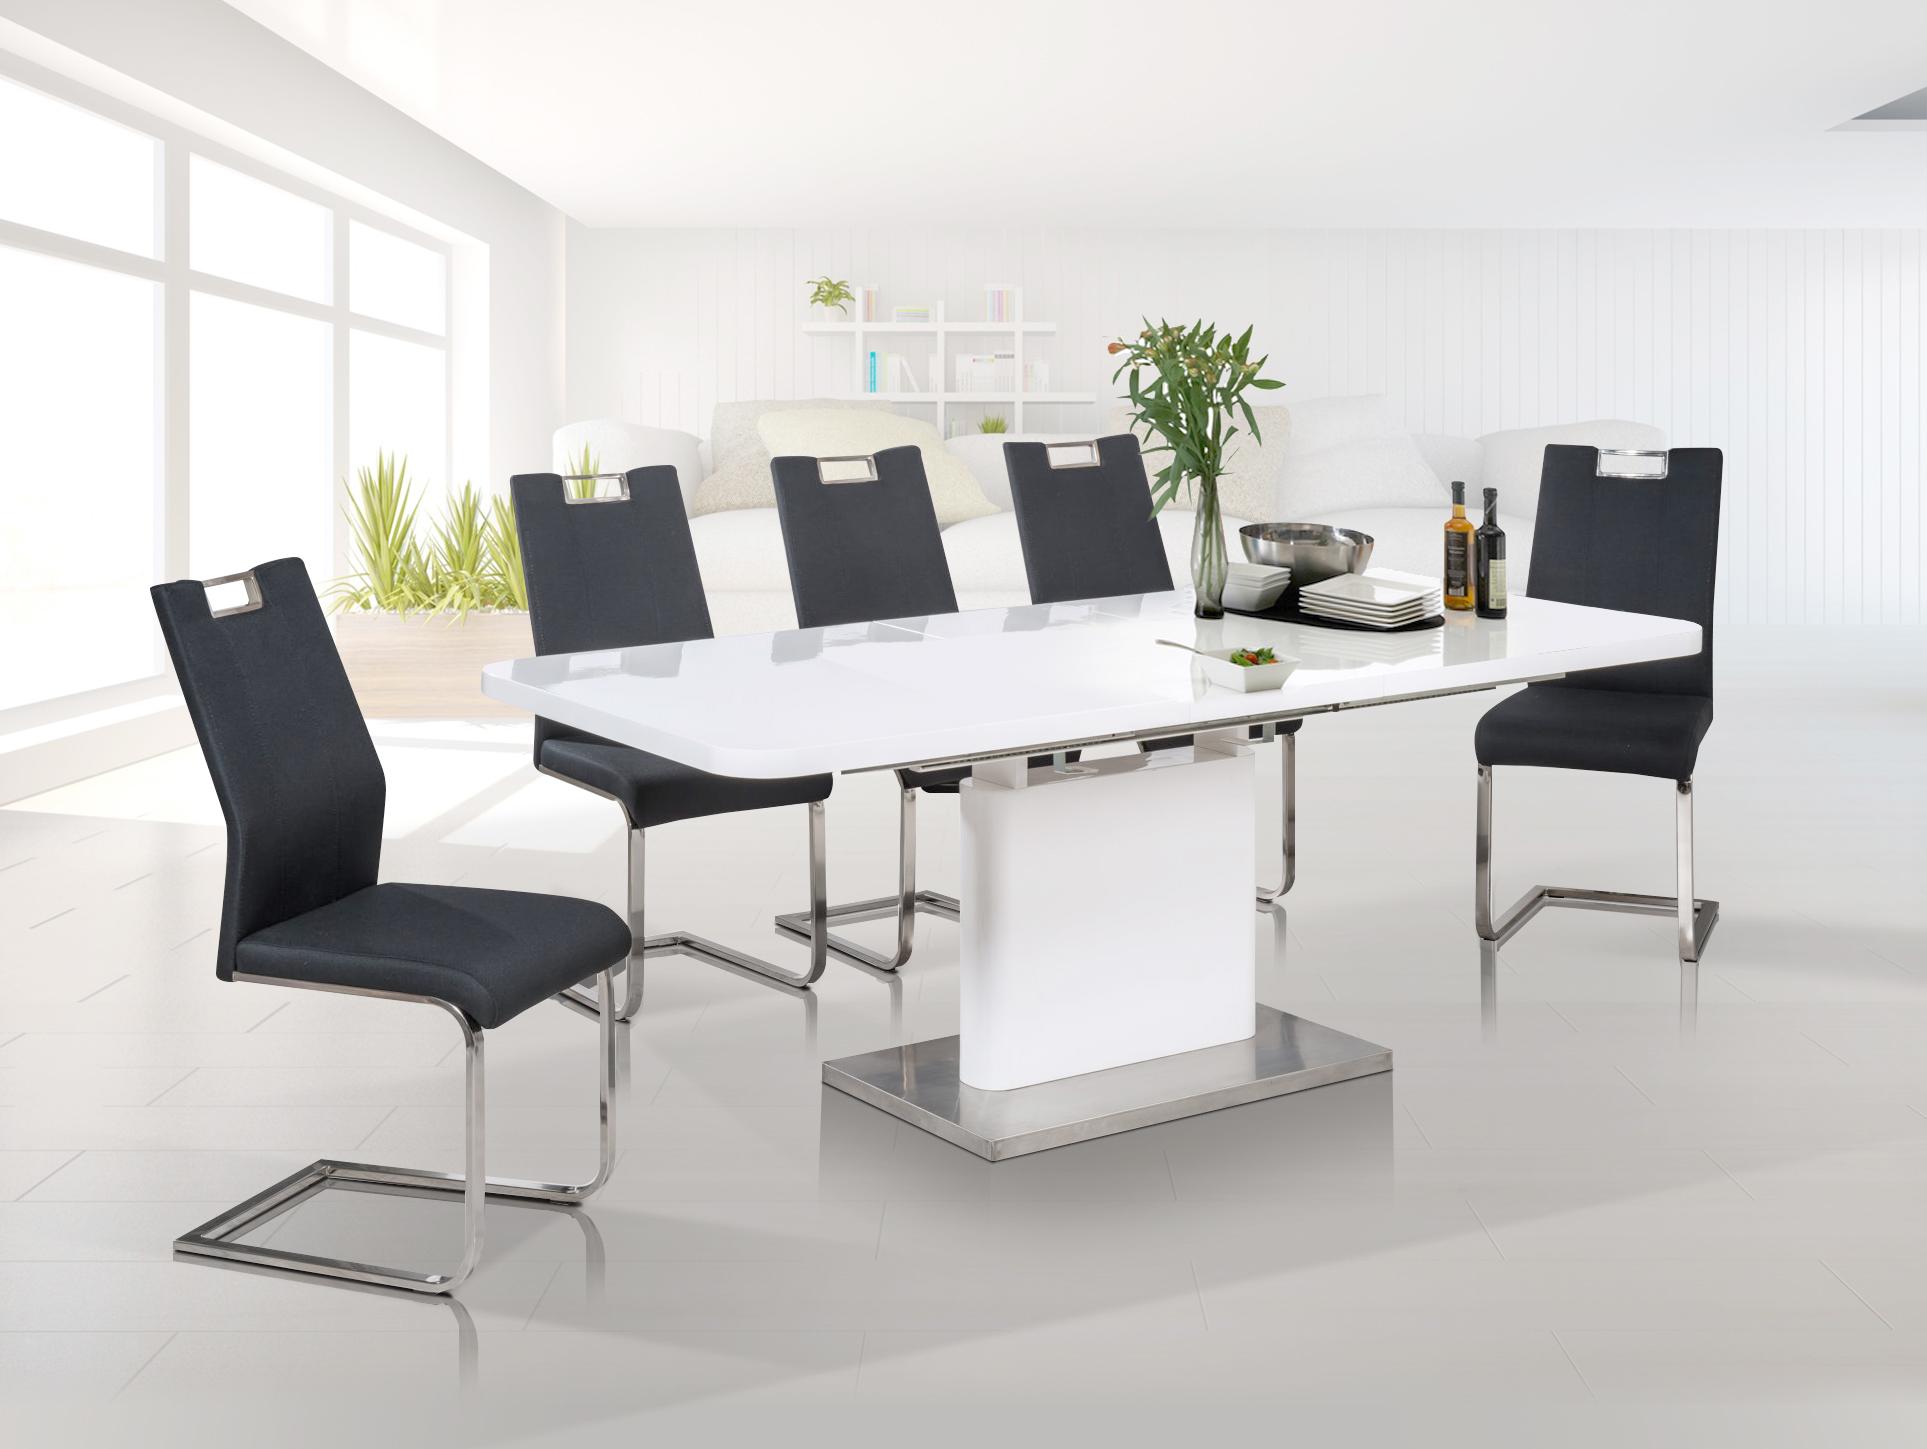 andrea esstisch 120 160x80 cm wei. Black Bedroom Furniture Sets. Home Design Ideas